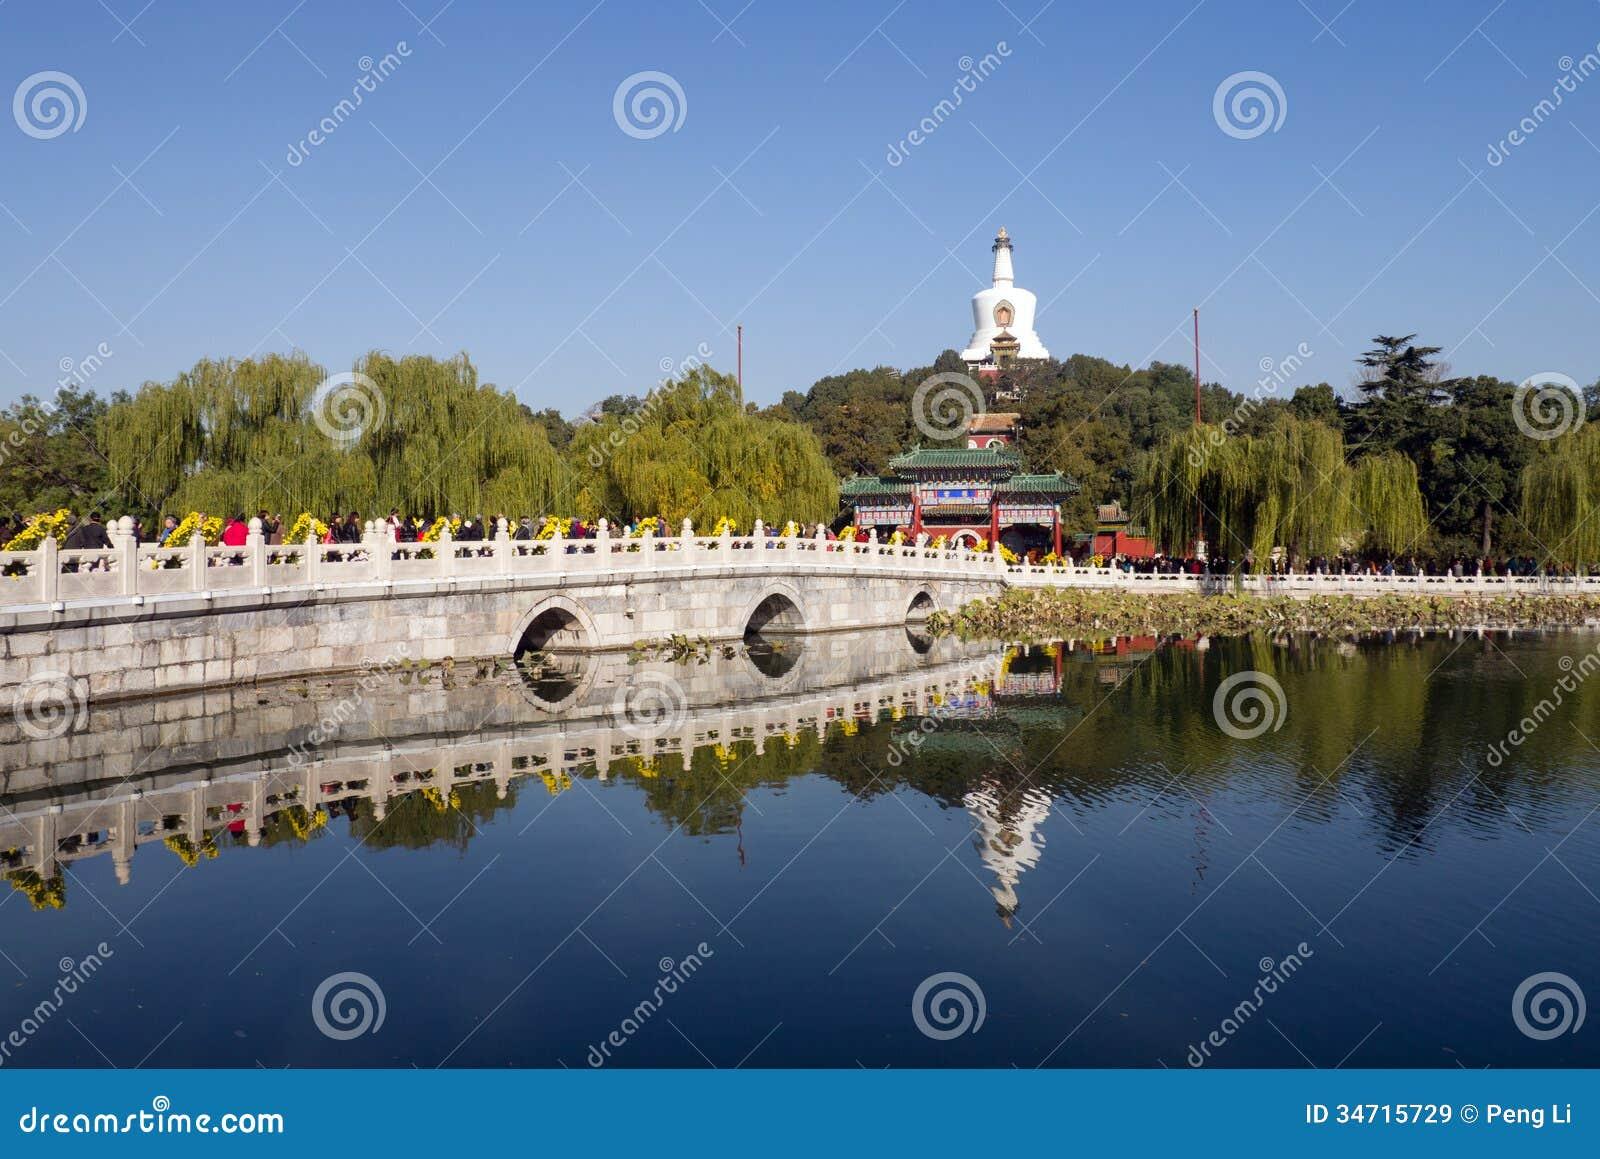 Beihai Park Royalty Free Stock Images Image 34715729